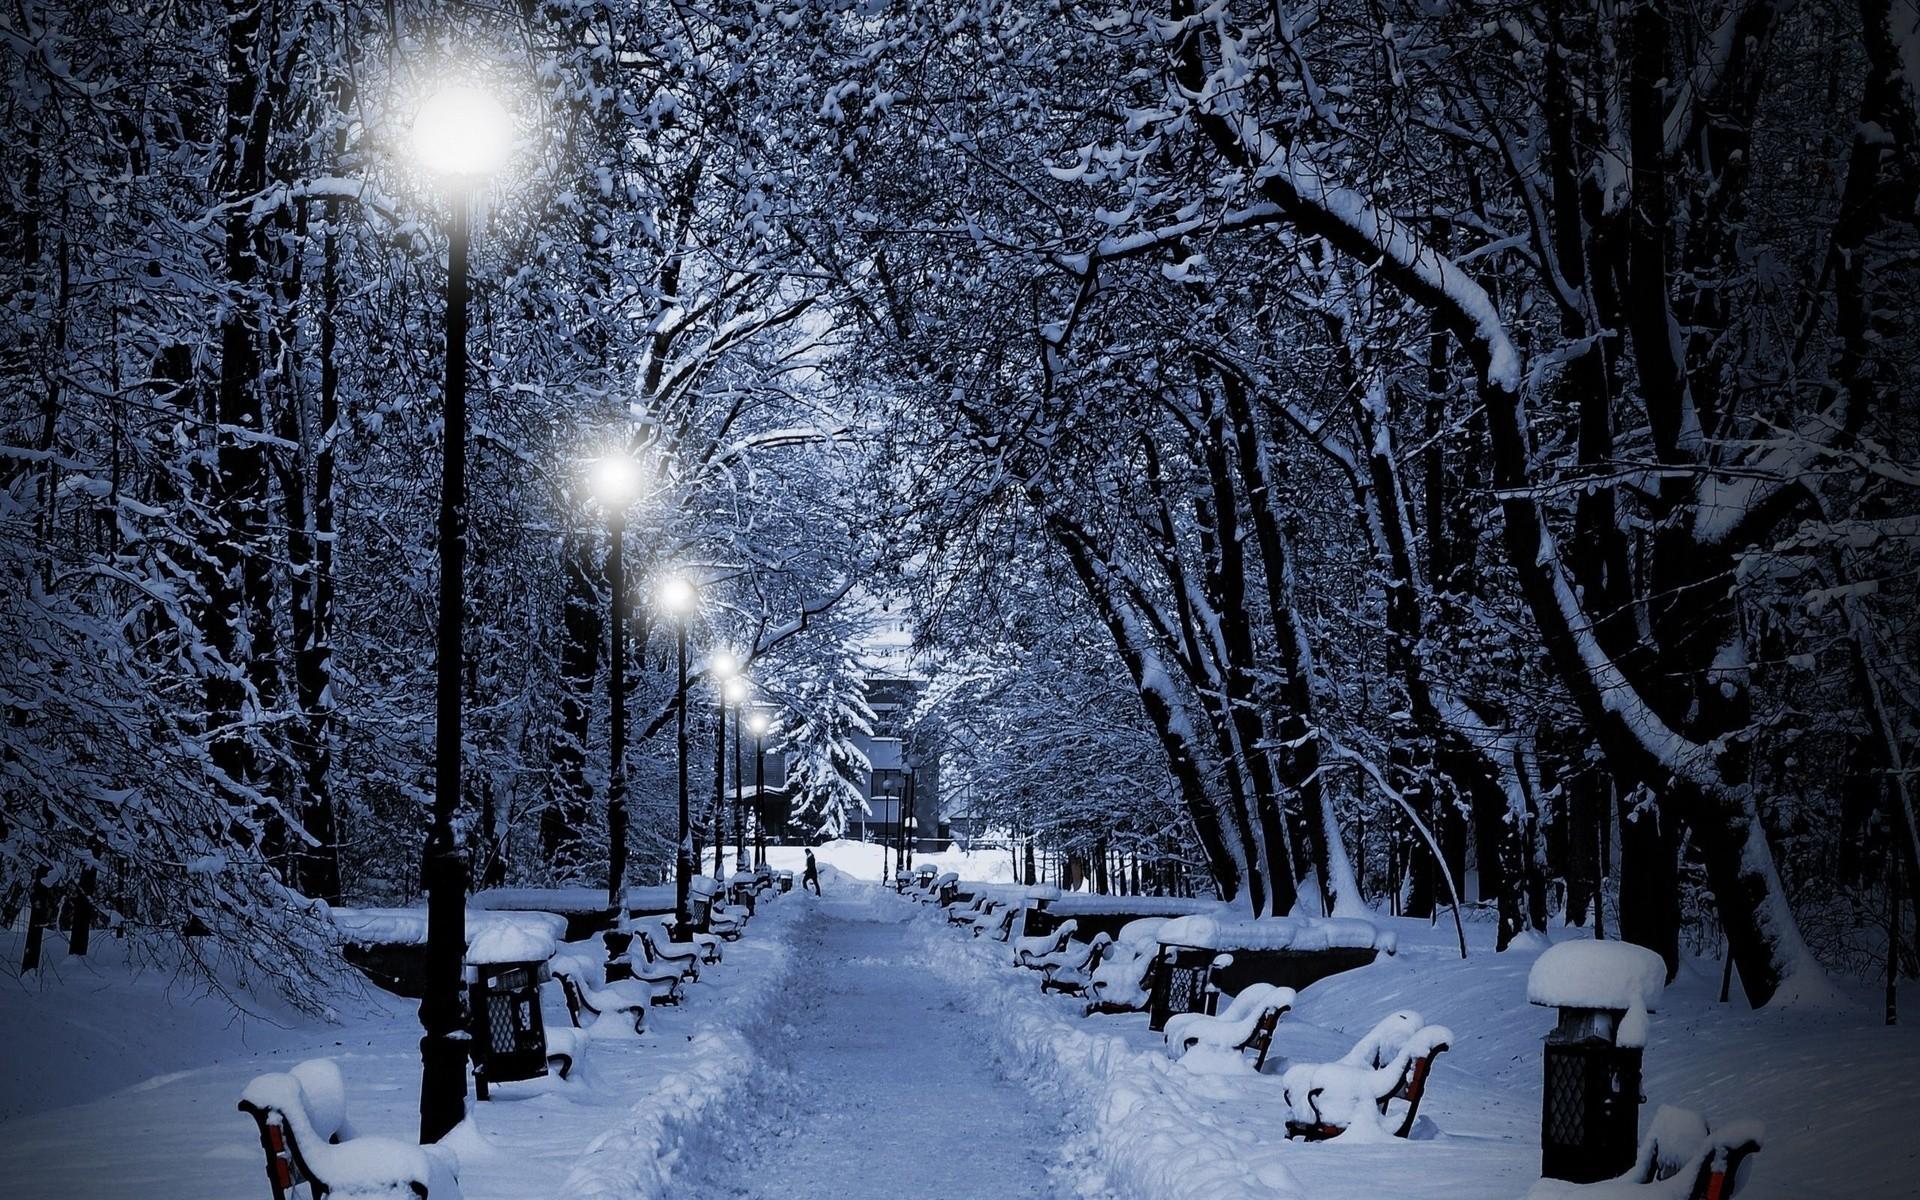 seasonal wallpapers and screensavers (53+ images)